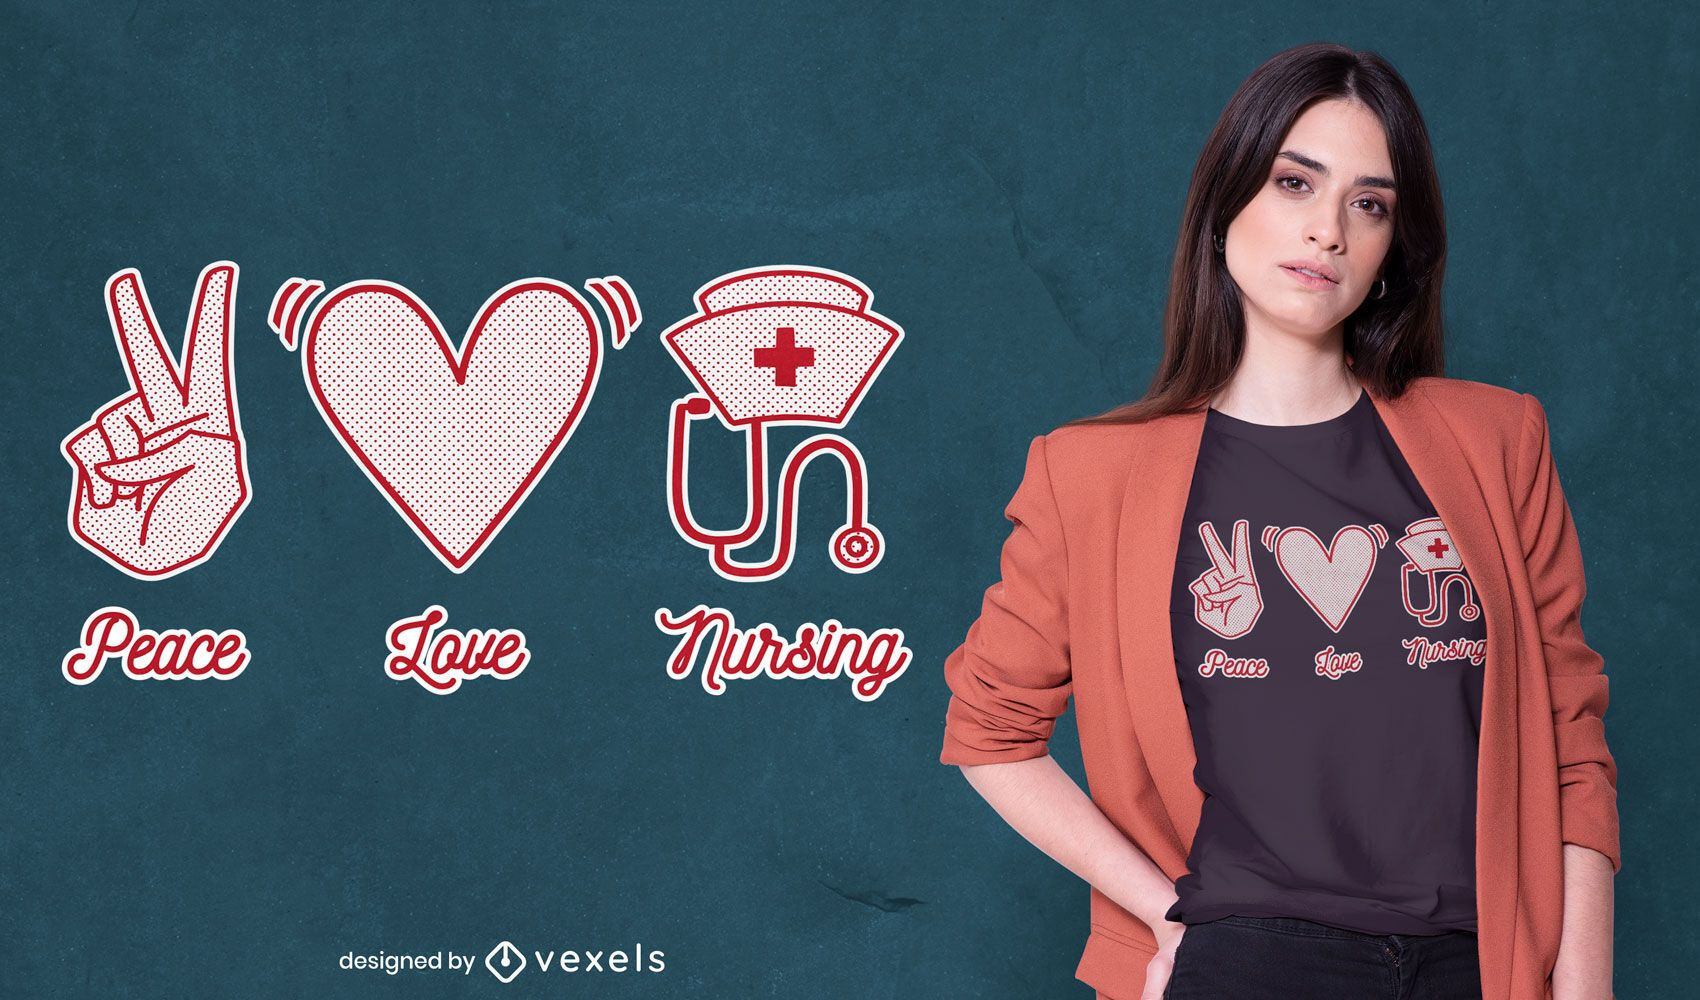 Peace love nursing t-shirt design